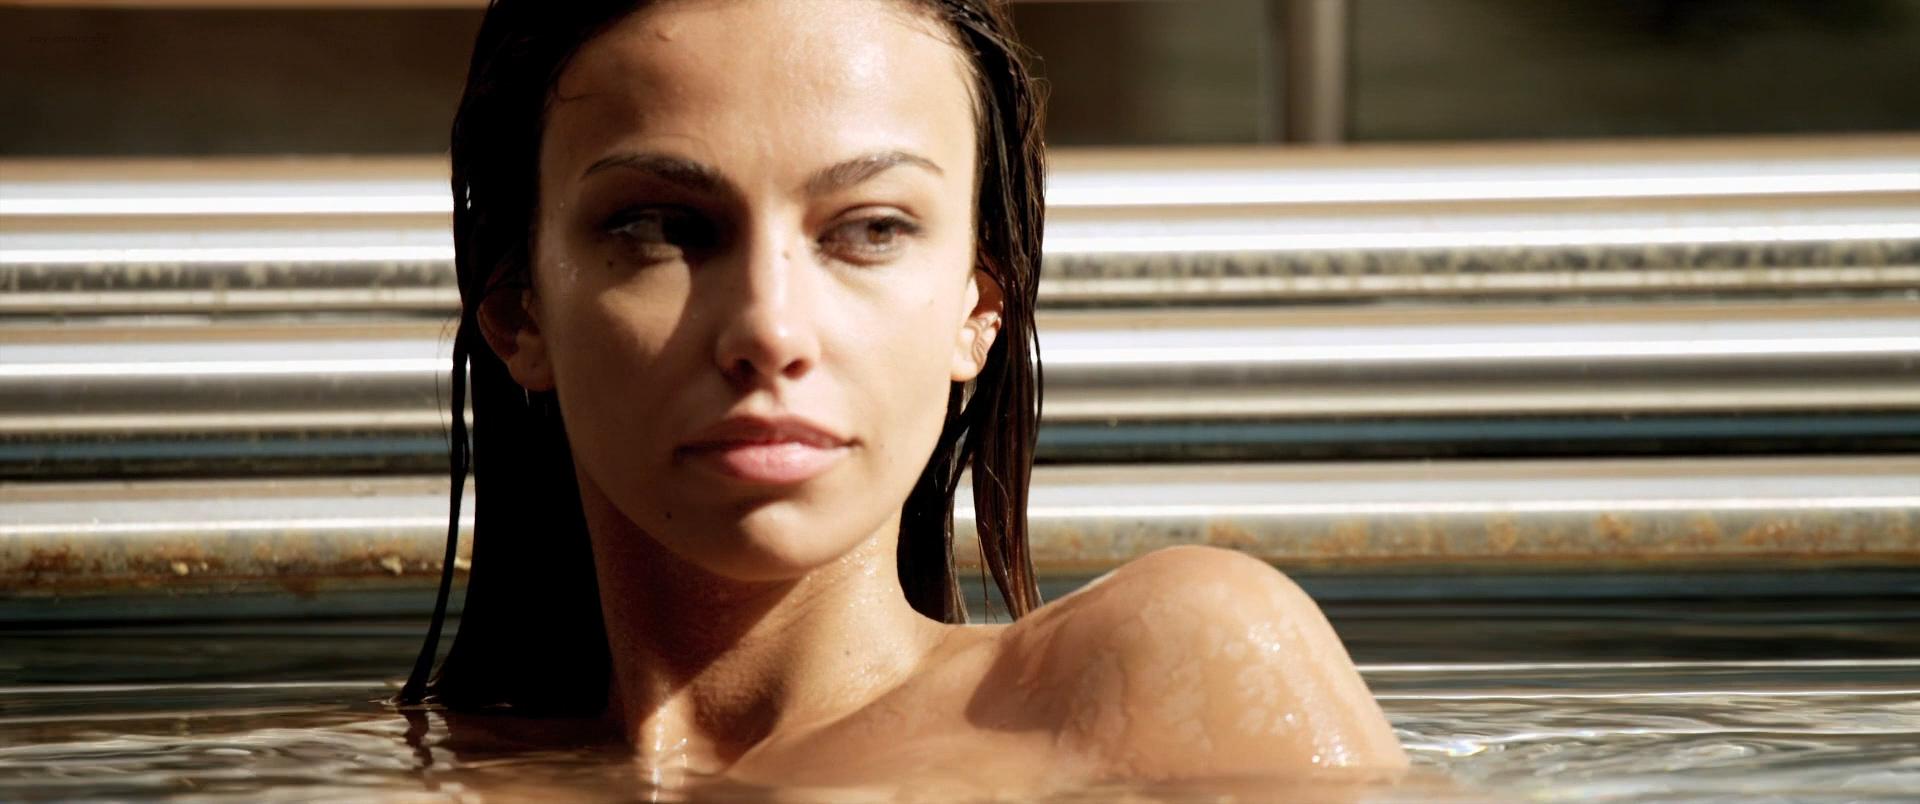 Madalina Diana Ghenea nude full frontal - Youth (IT-2015) HD 1080p (1)